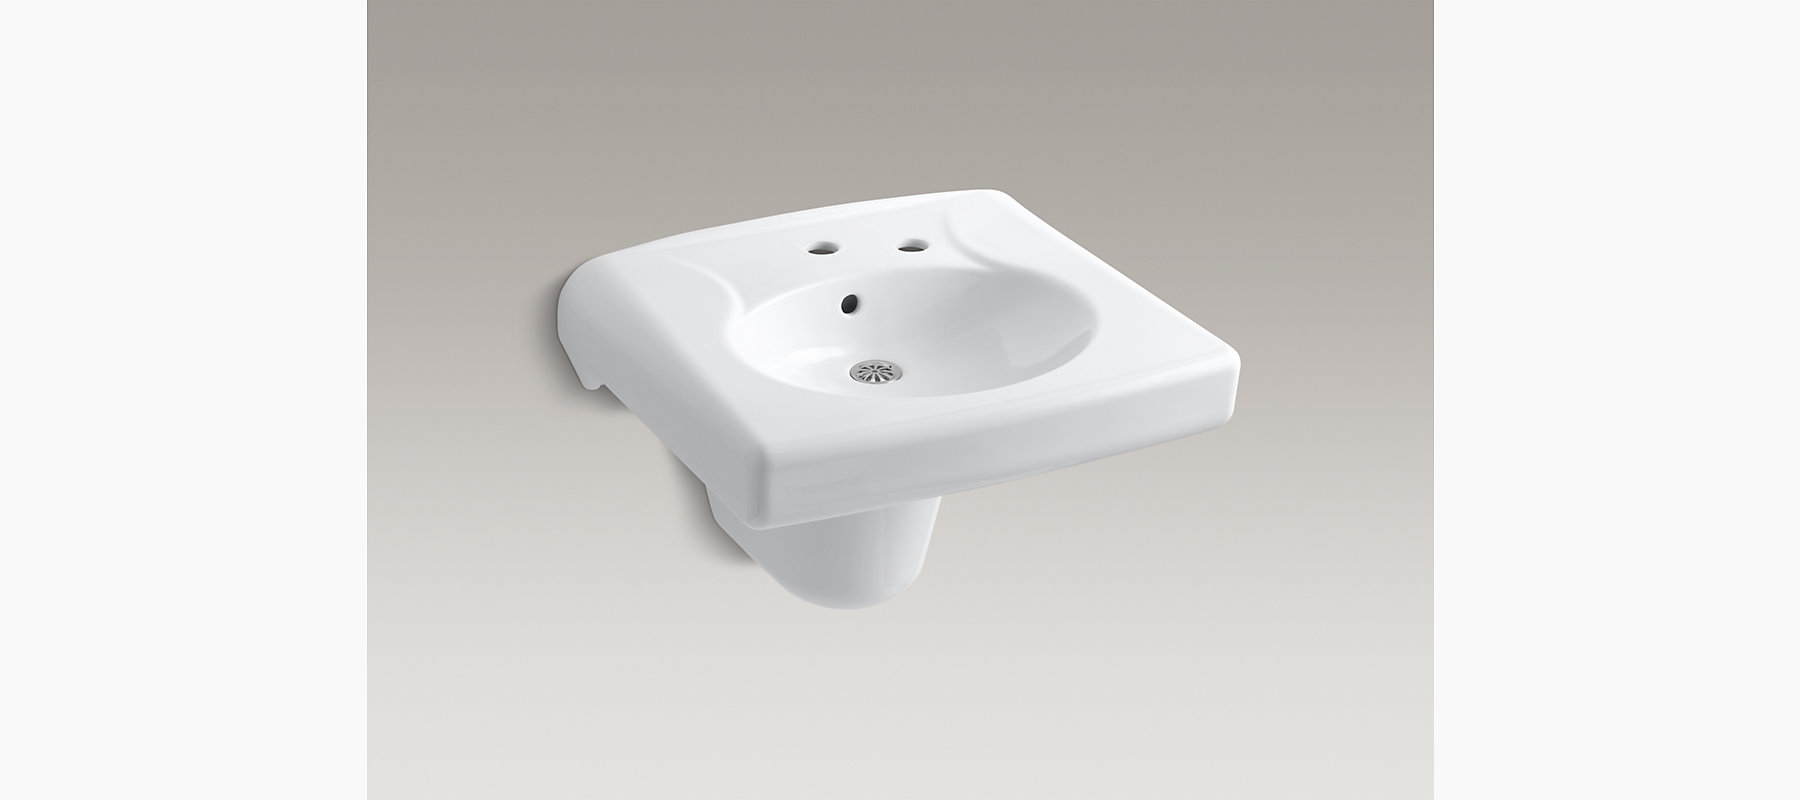 Brenham Wall Mount Sink With Single Faucet Hole K 1999 1r Kohler